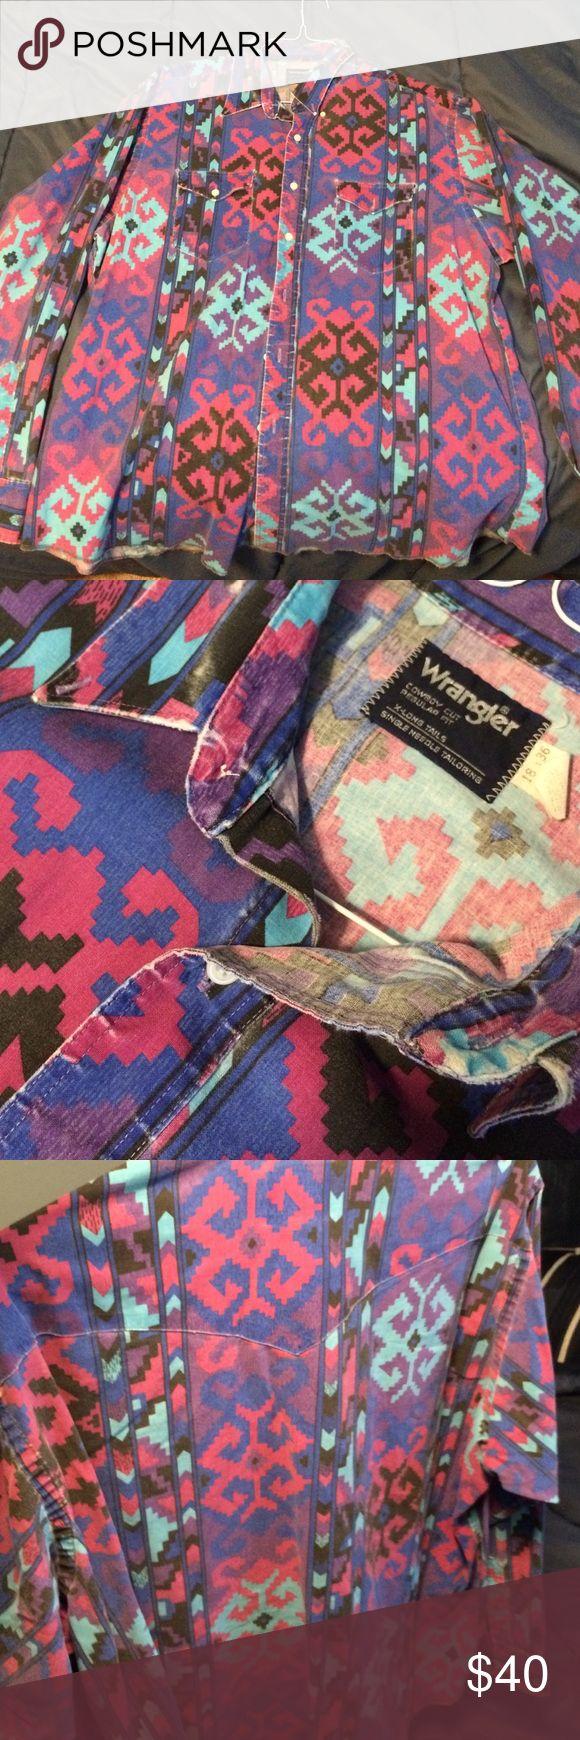 Wrangler button up tribal shirt Very nice vintage wrangler button down. Snowflake tribal print all over. Don't sleep! 😴 Wrangler Tops Button Down Shirts